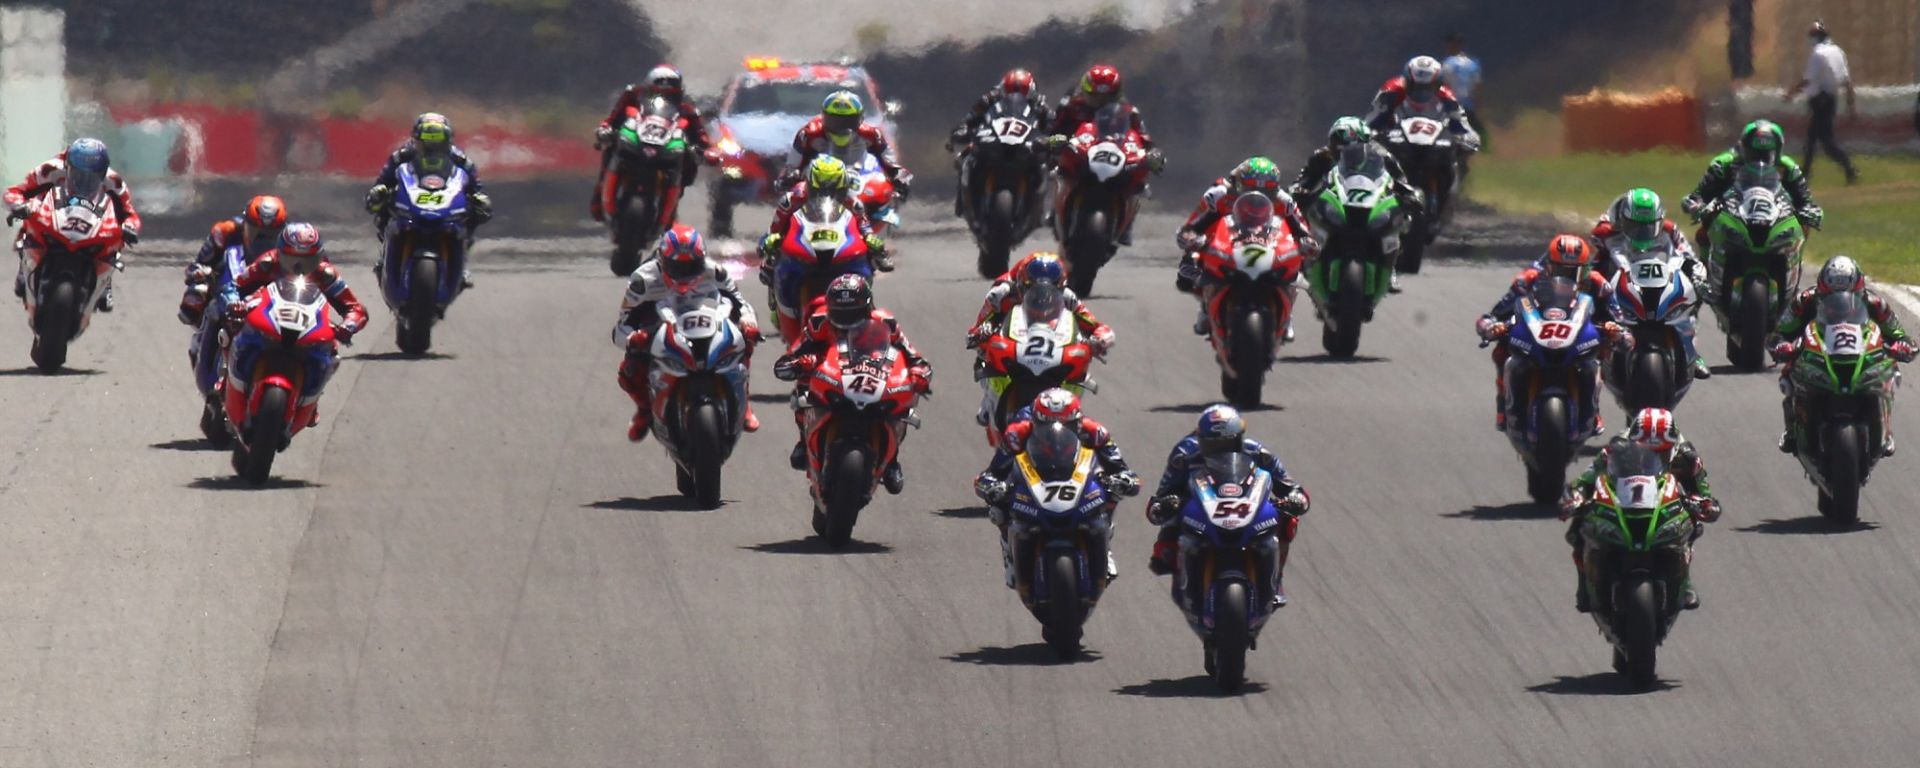 Superbike Portimao 2020, la partenza